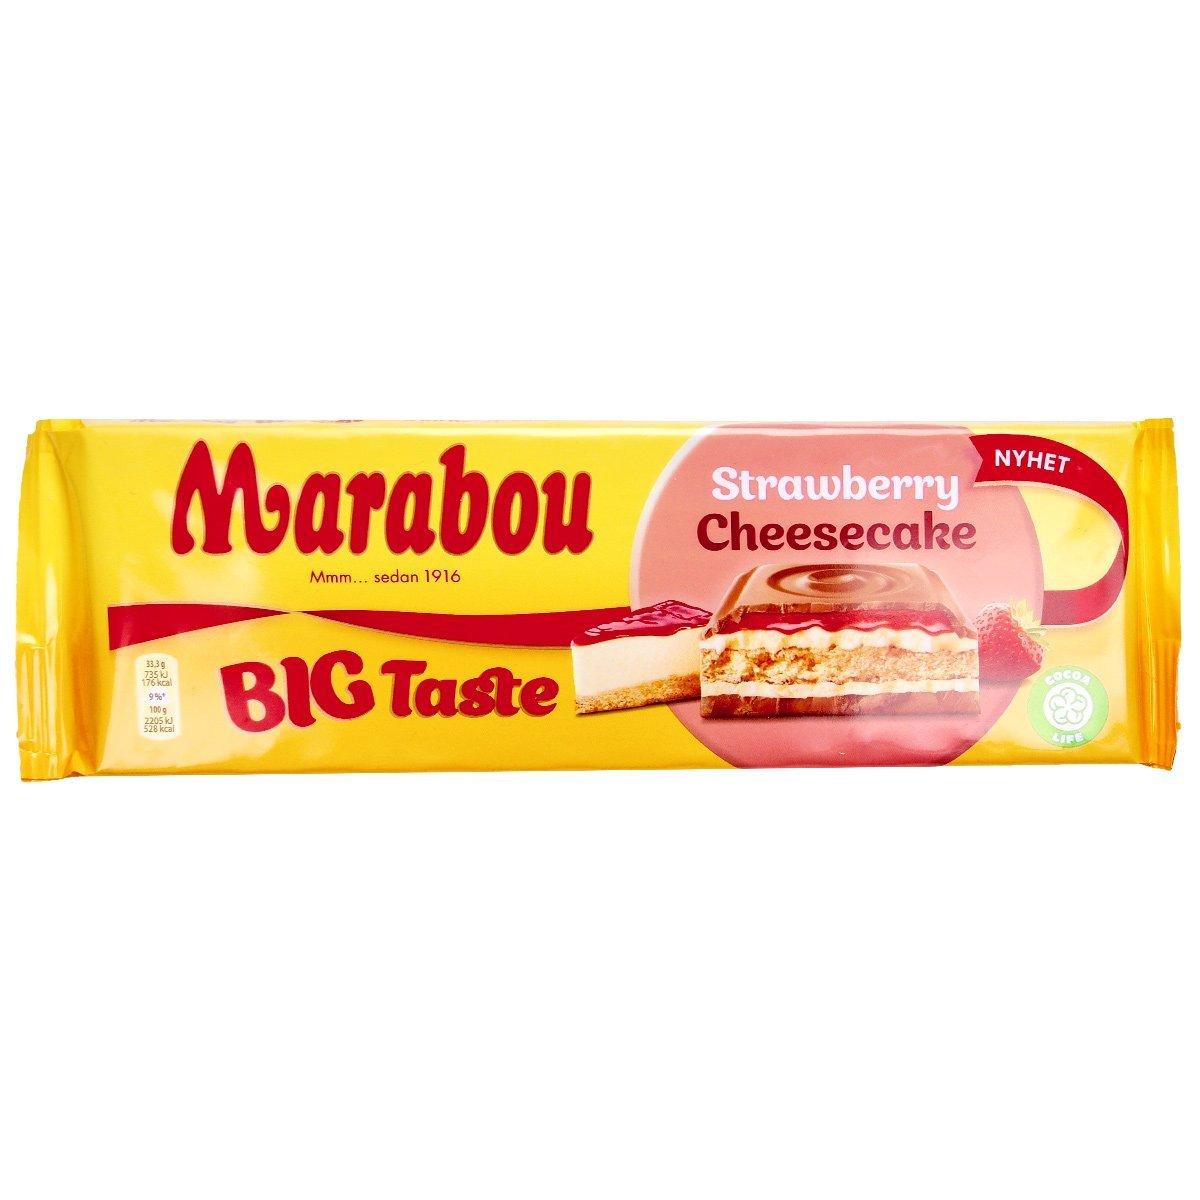 Marabou Big Taste Strawberry Cheesecake (300g) 1